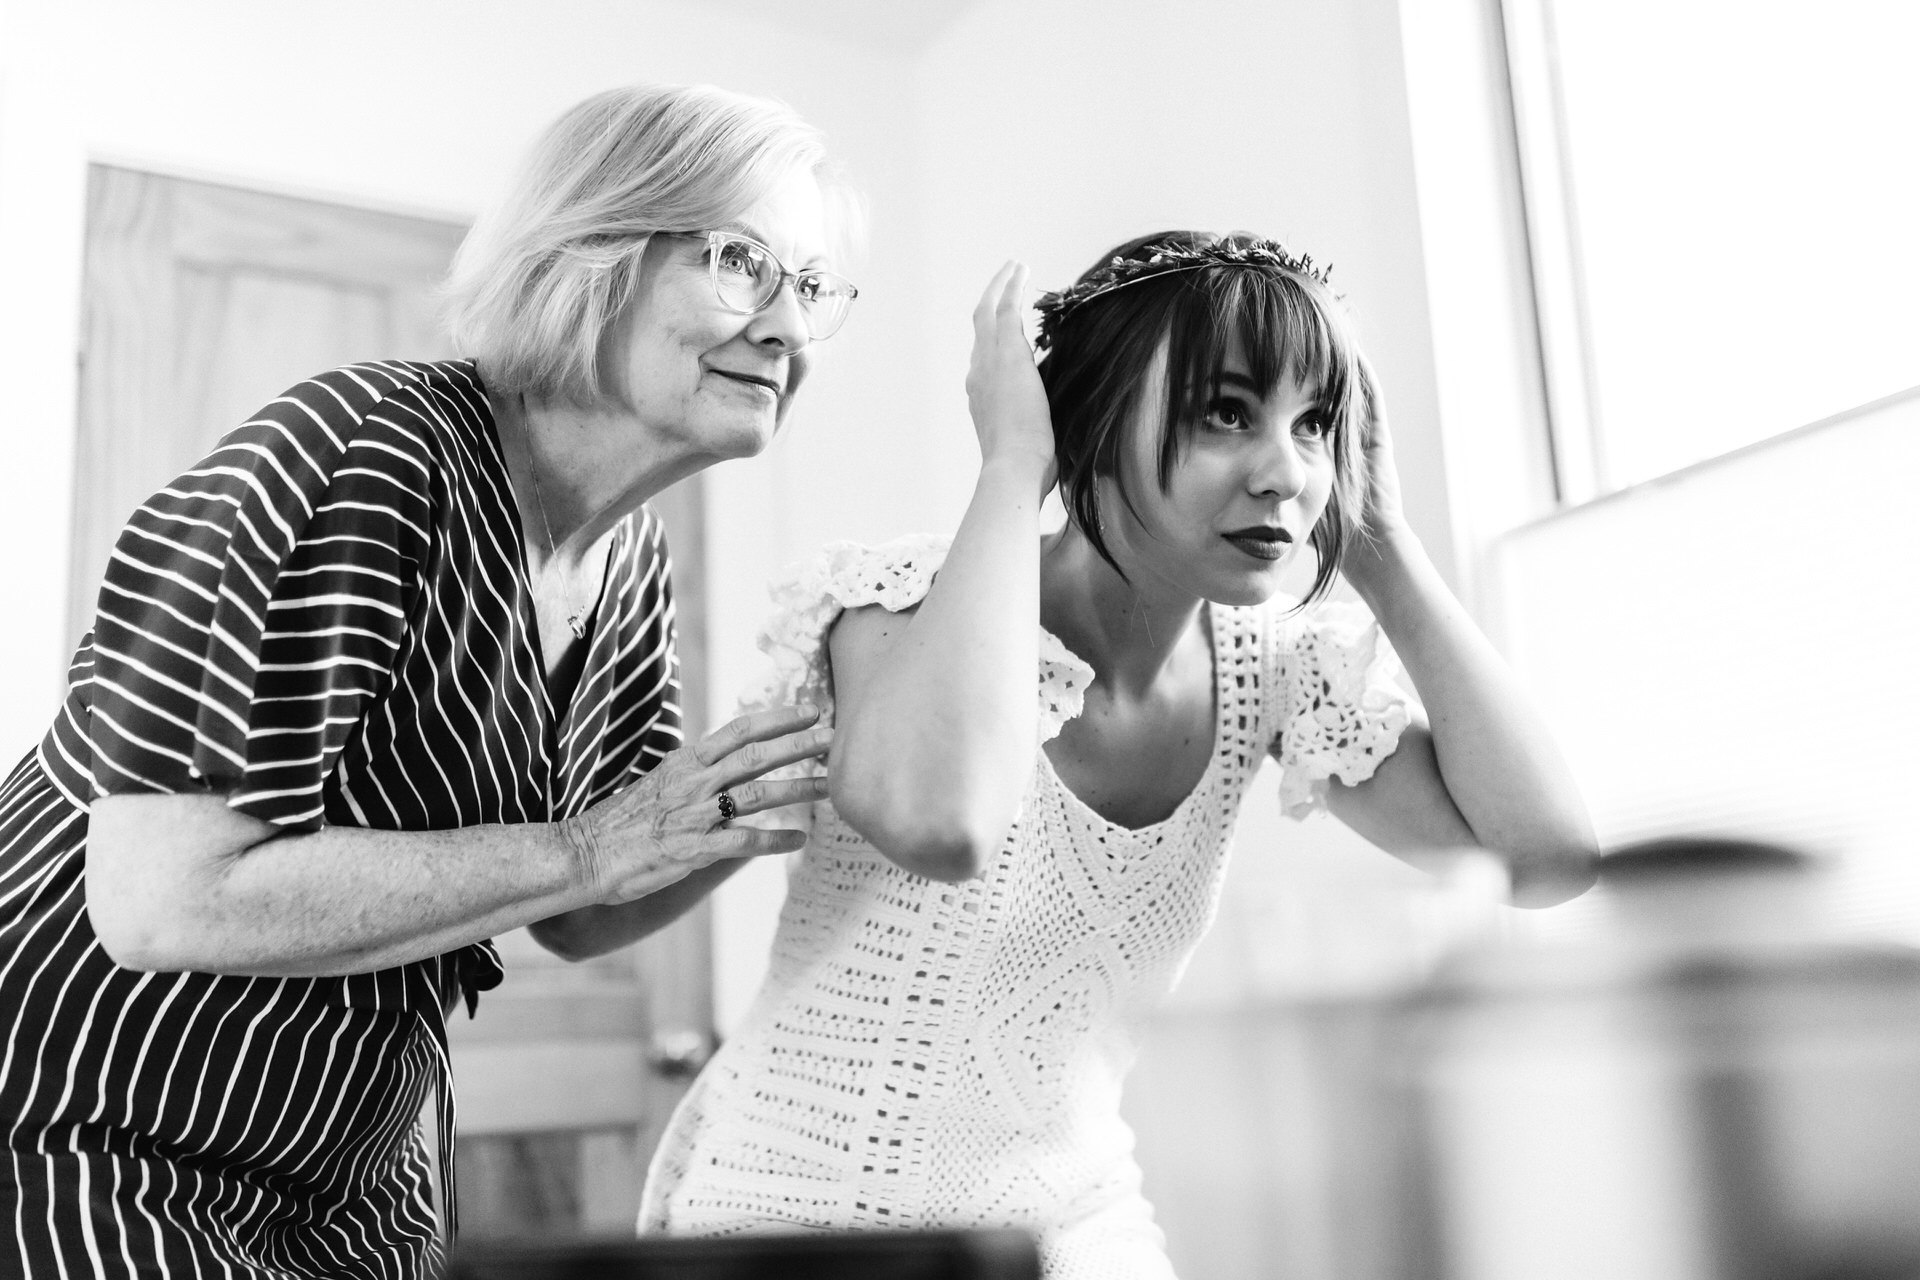 BW Wedding Photographer for Charlottesville, VA | putting on the finishing touches